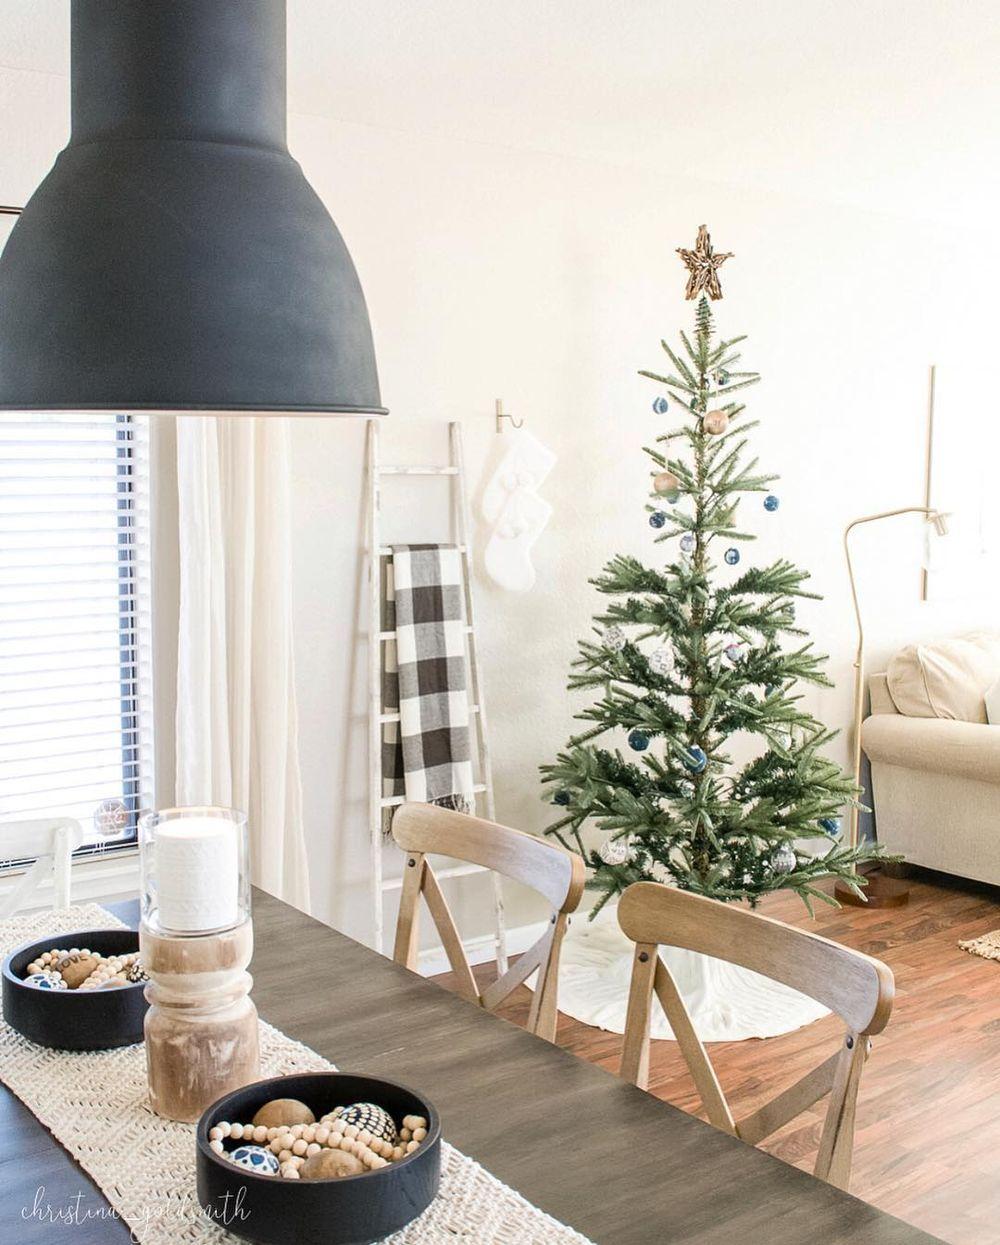 Scandi Christmas Dining Room with Wall Ladder via @christina_goldsmith